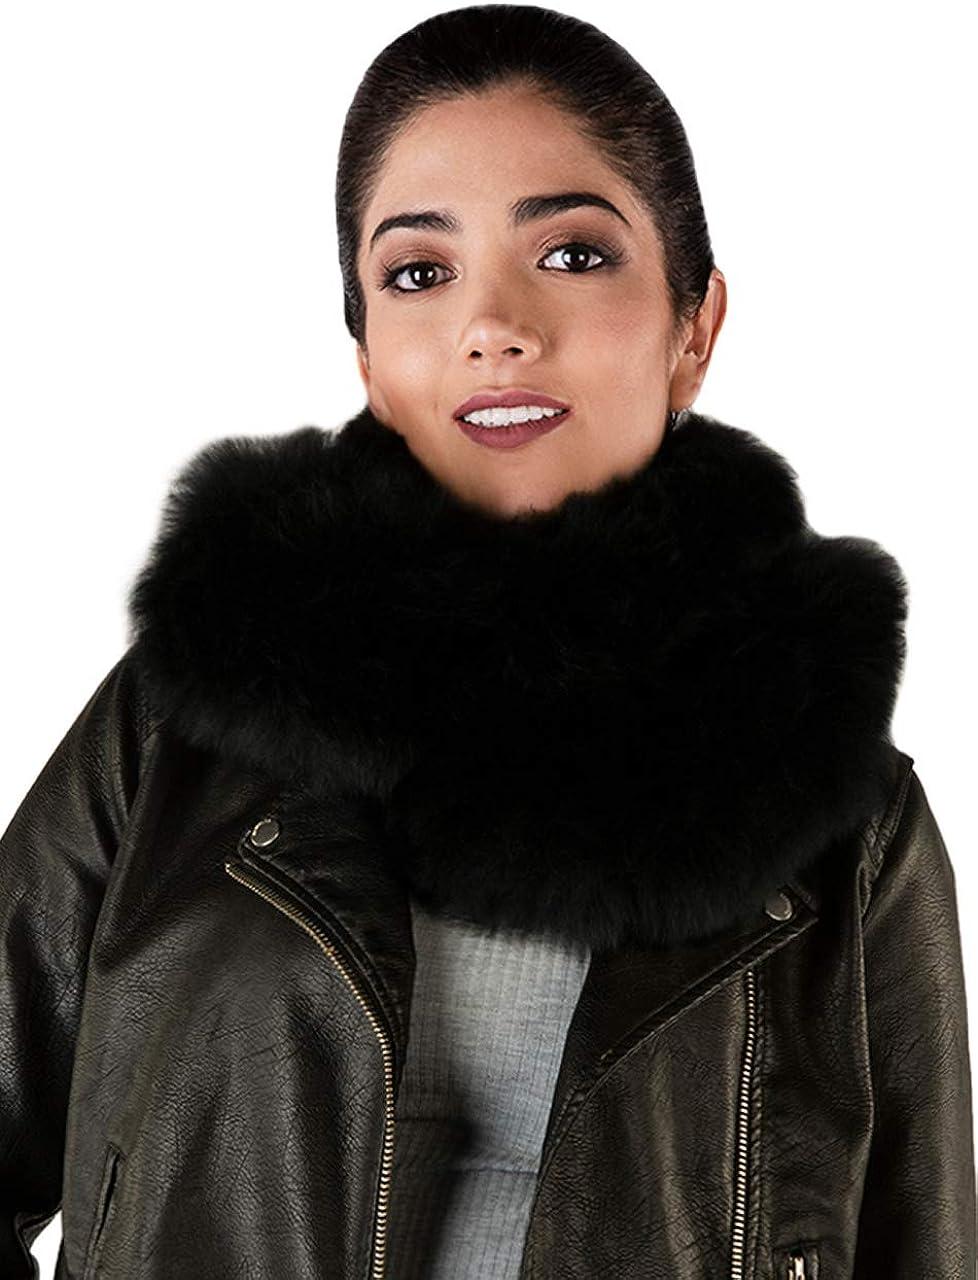 Inca Fashions Women's 100% Alpaca Fur Winter Scarf & Wrap Collar - Not Faux Fur - Guilt Free - Luxurious